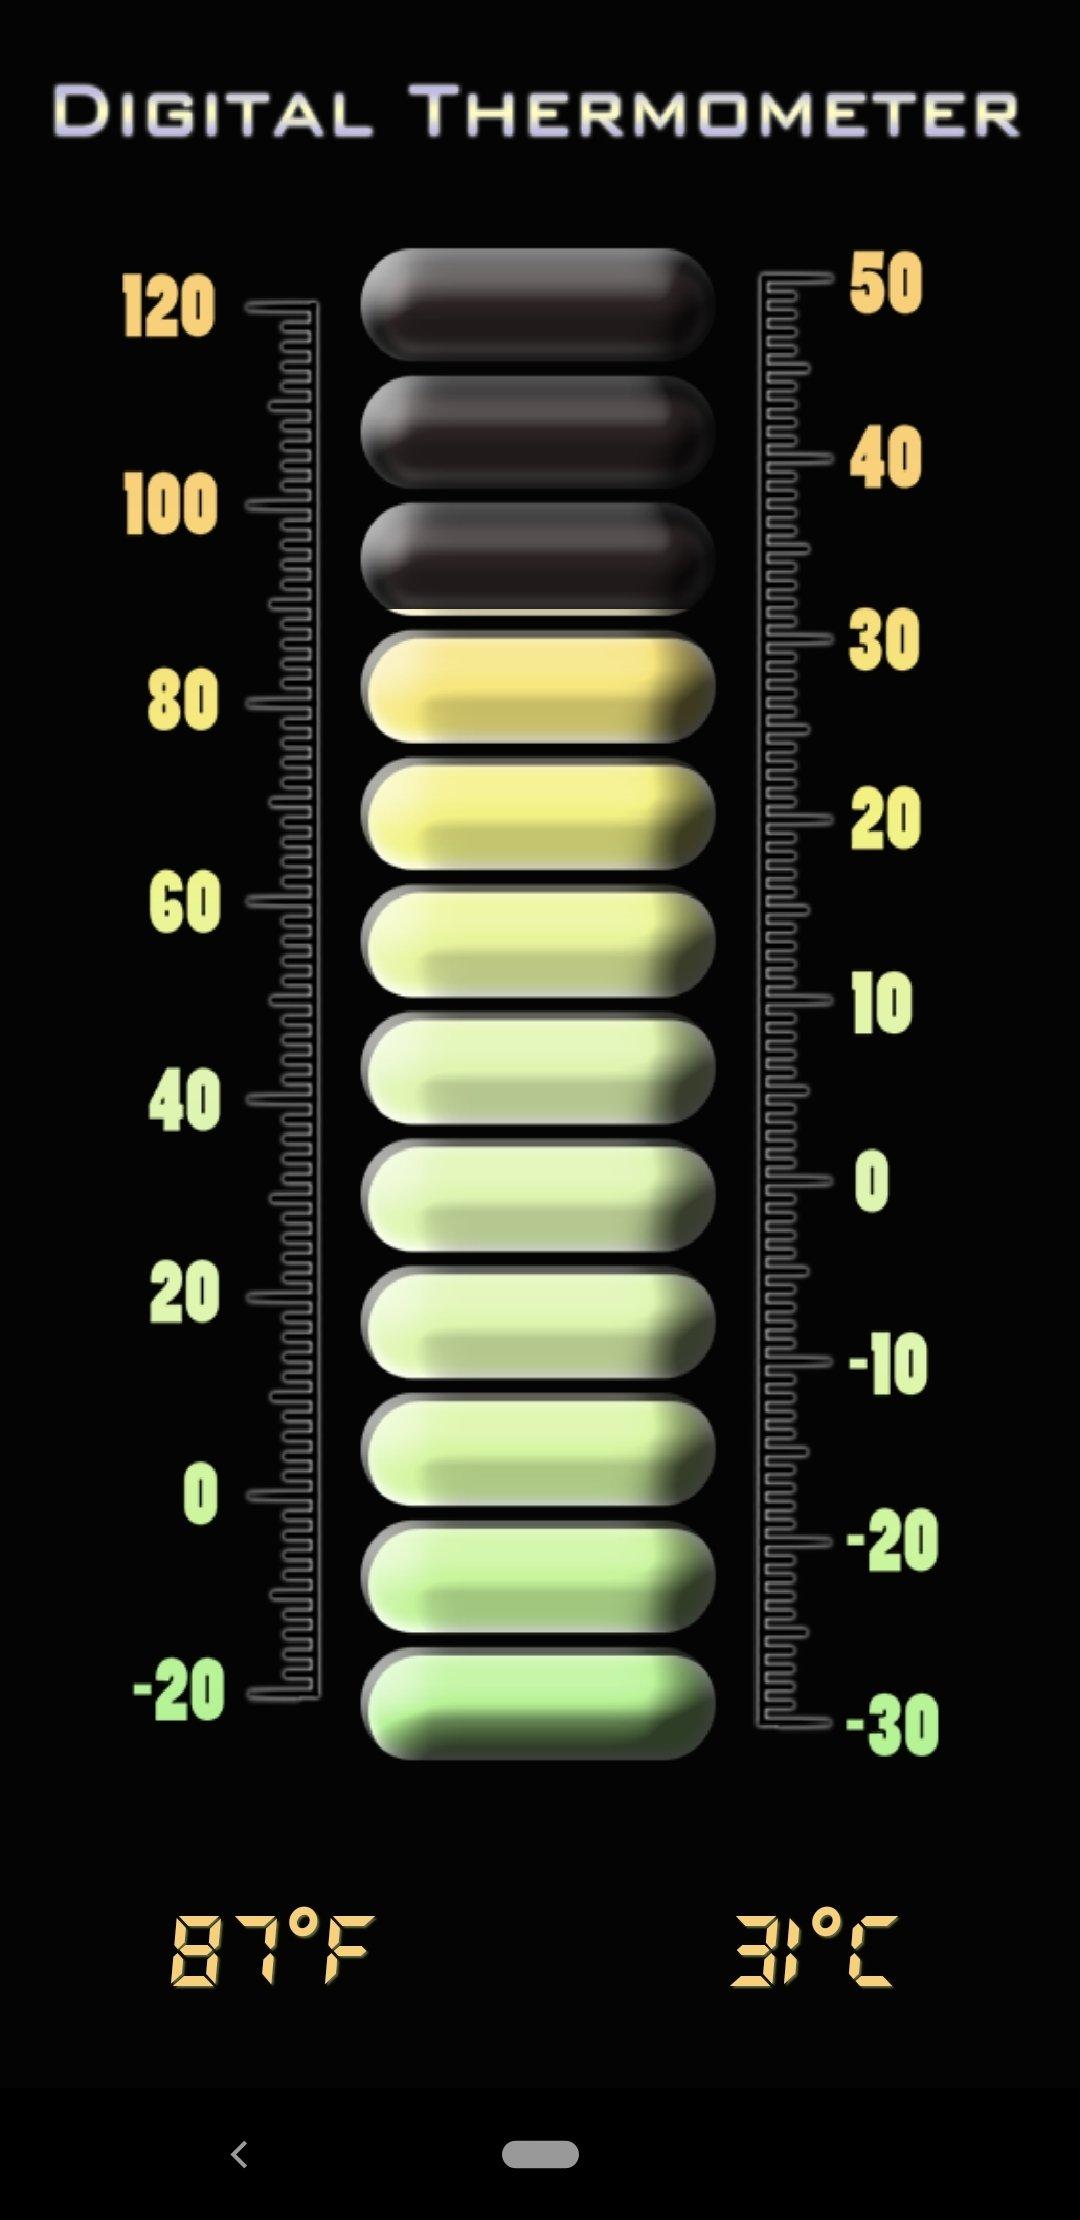 Termometro Digital 24 0 Descargar Para Android Apk Gratis Ormai sai già che, qualunque cosa tu stia cercando, lo troverai su aliexpress. descargar para android apk gratis